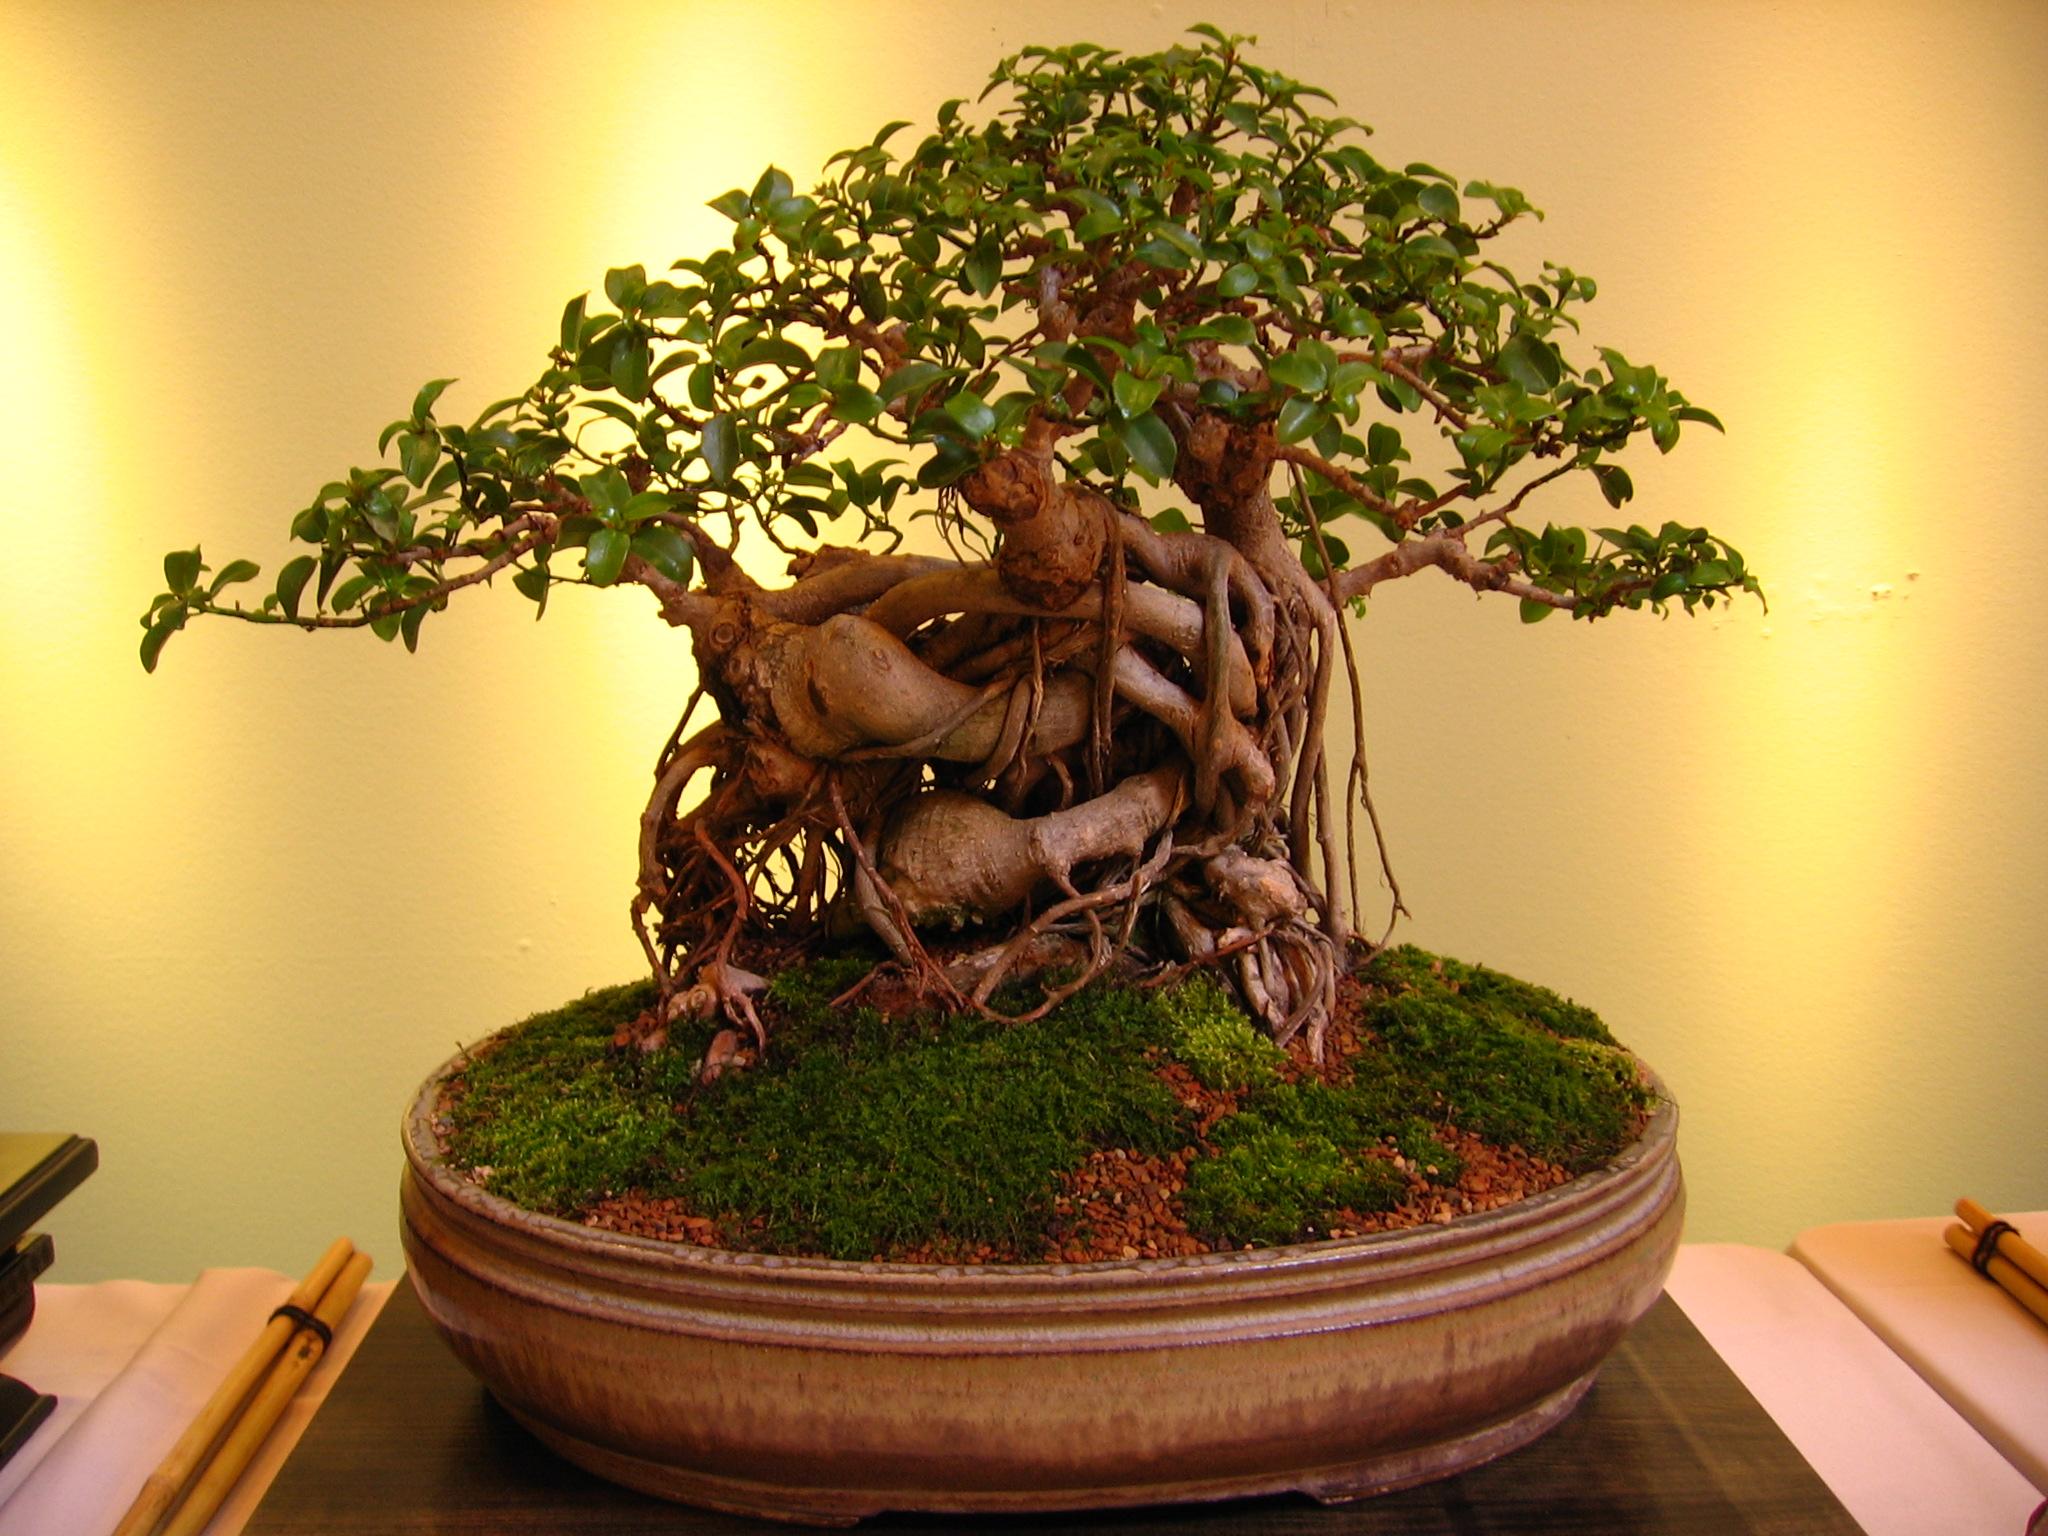 10 Things To Avoid When Growing Your Bonsai Tree   Bonsai Tree Gardener